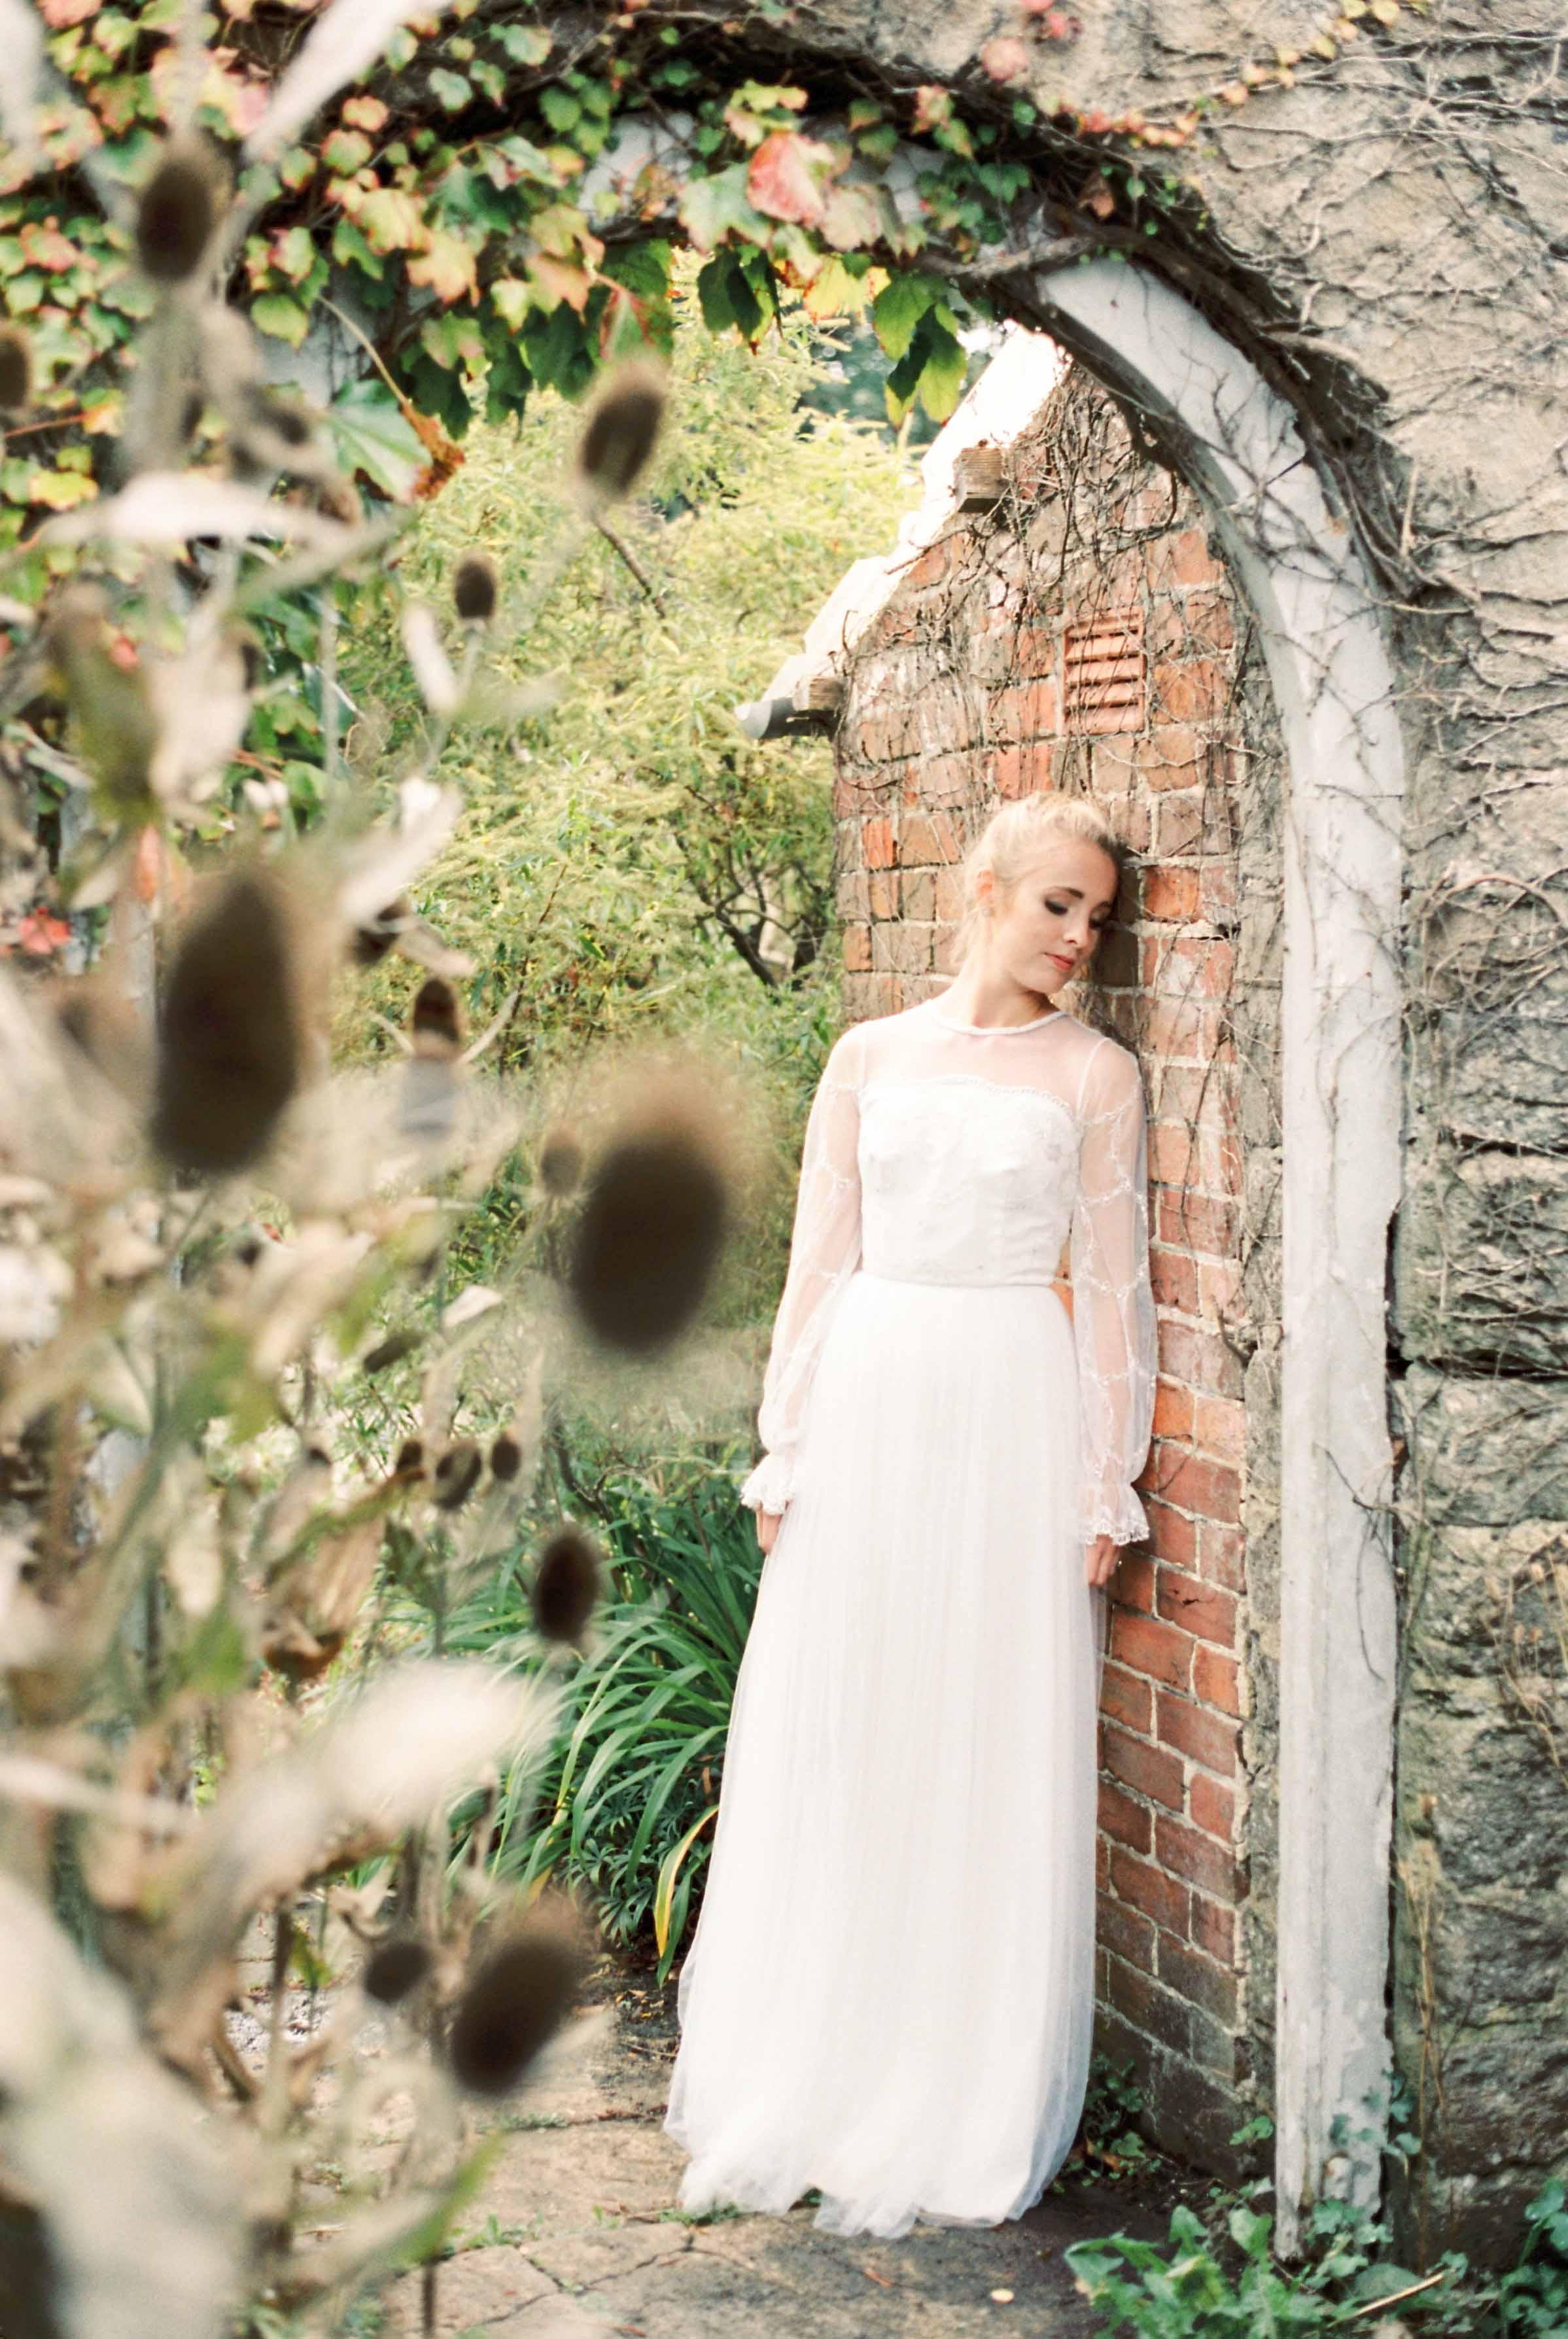 dorset-fine-art-wedding-photographer_amelia_carmencita_lores-2-of-6